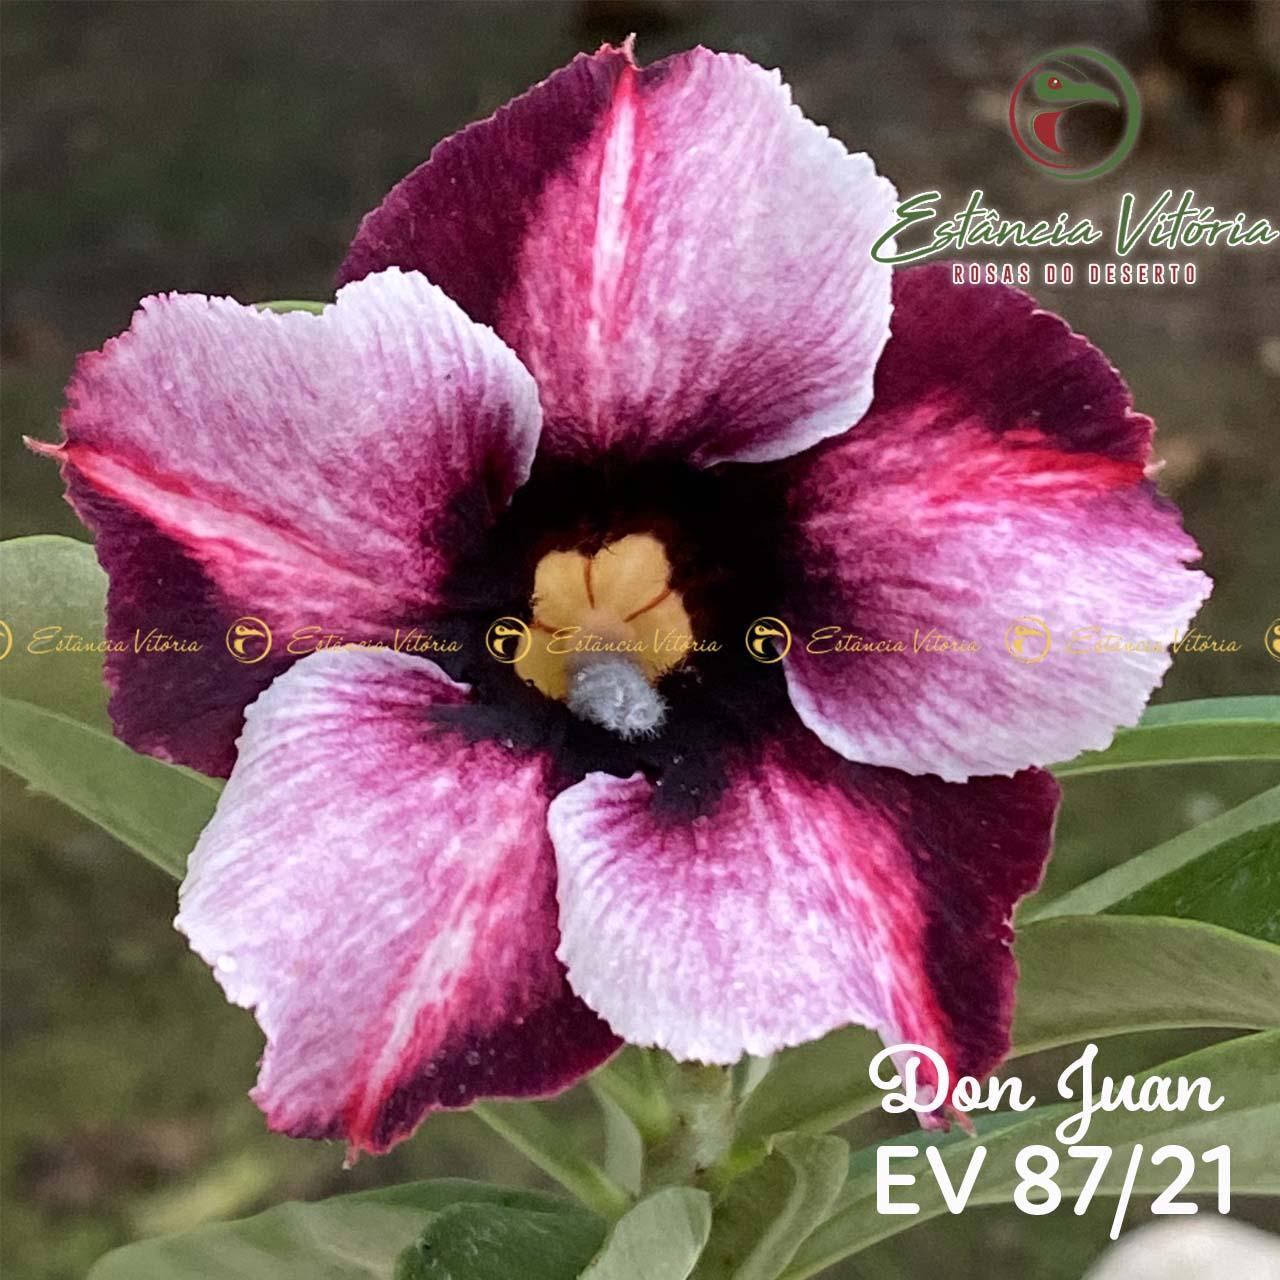 Muda de Rosa do Deserto Don Juan EV-08721